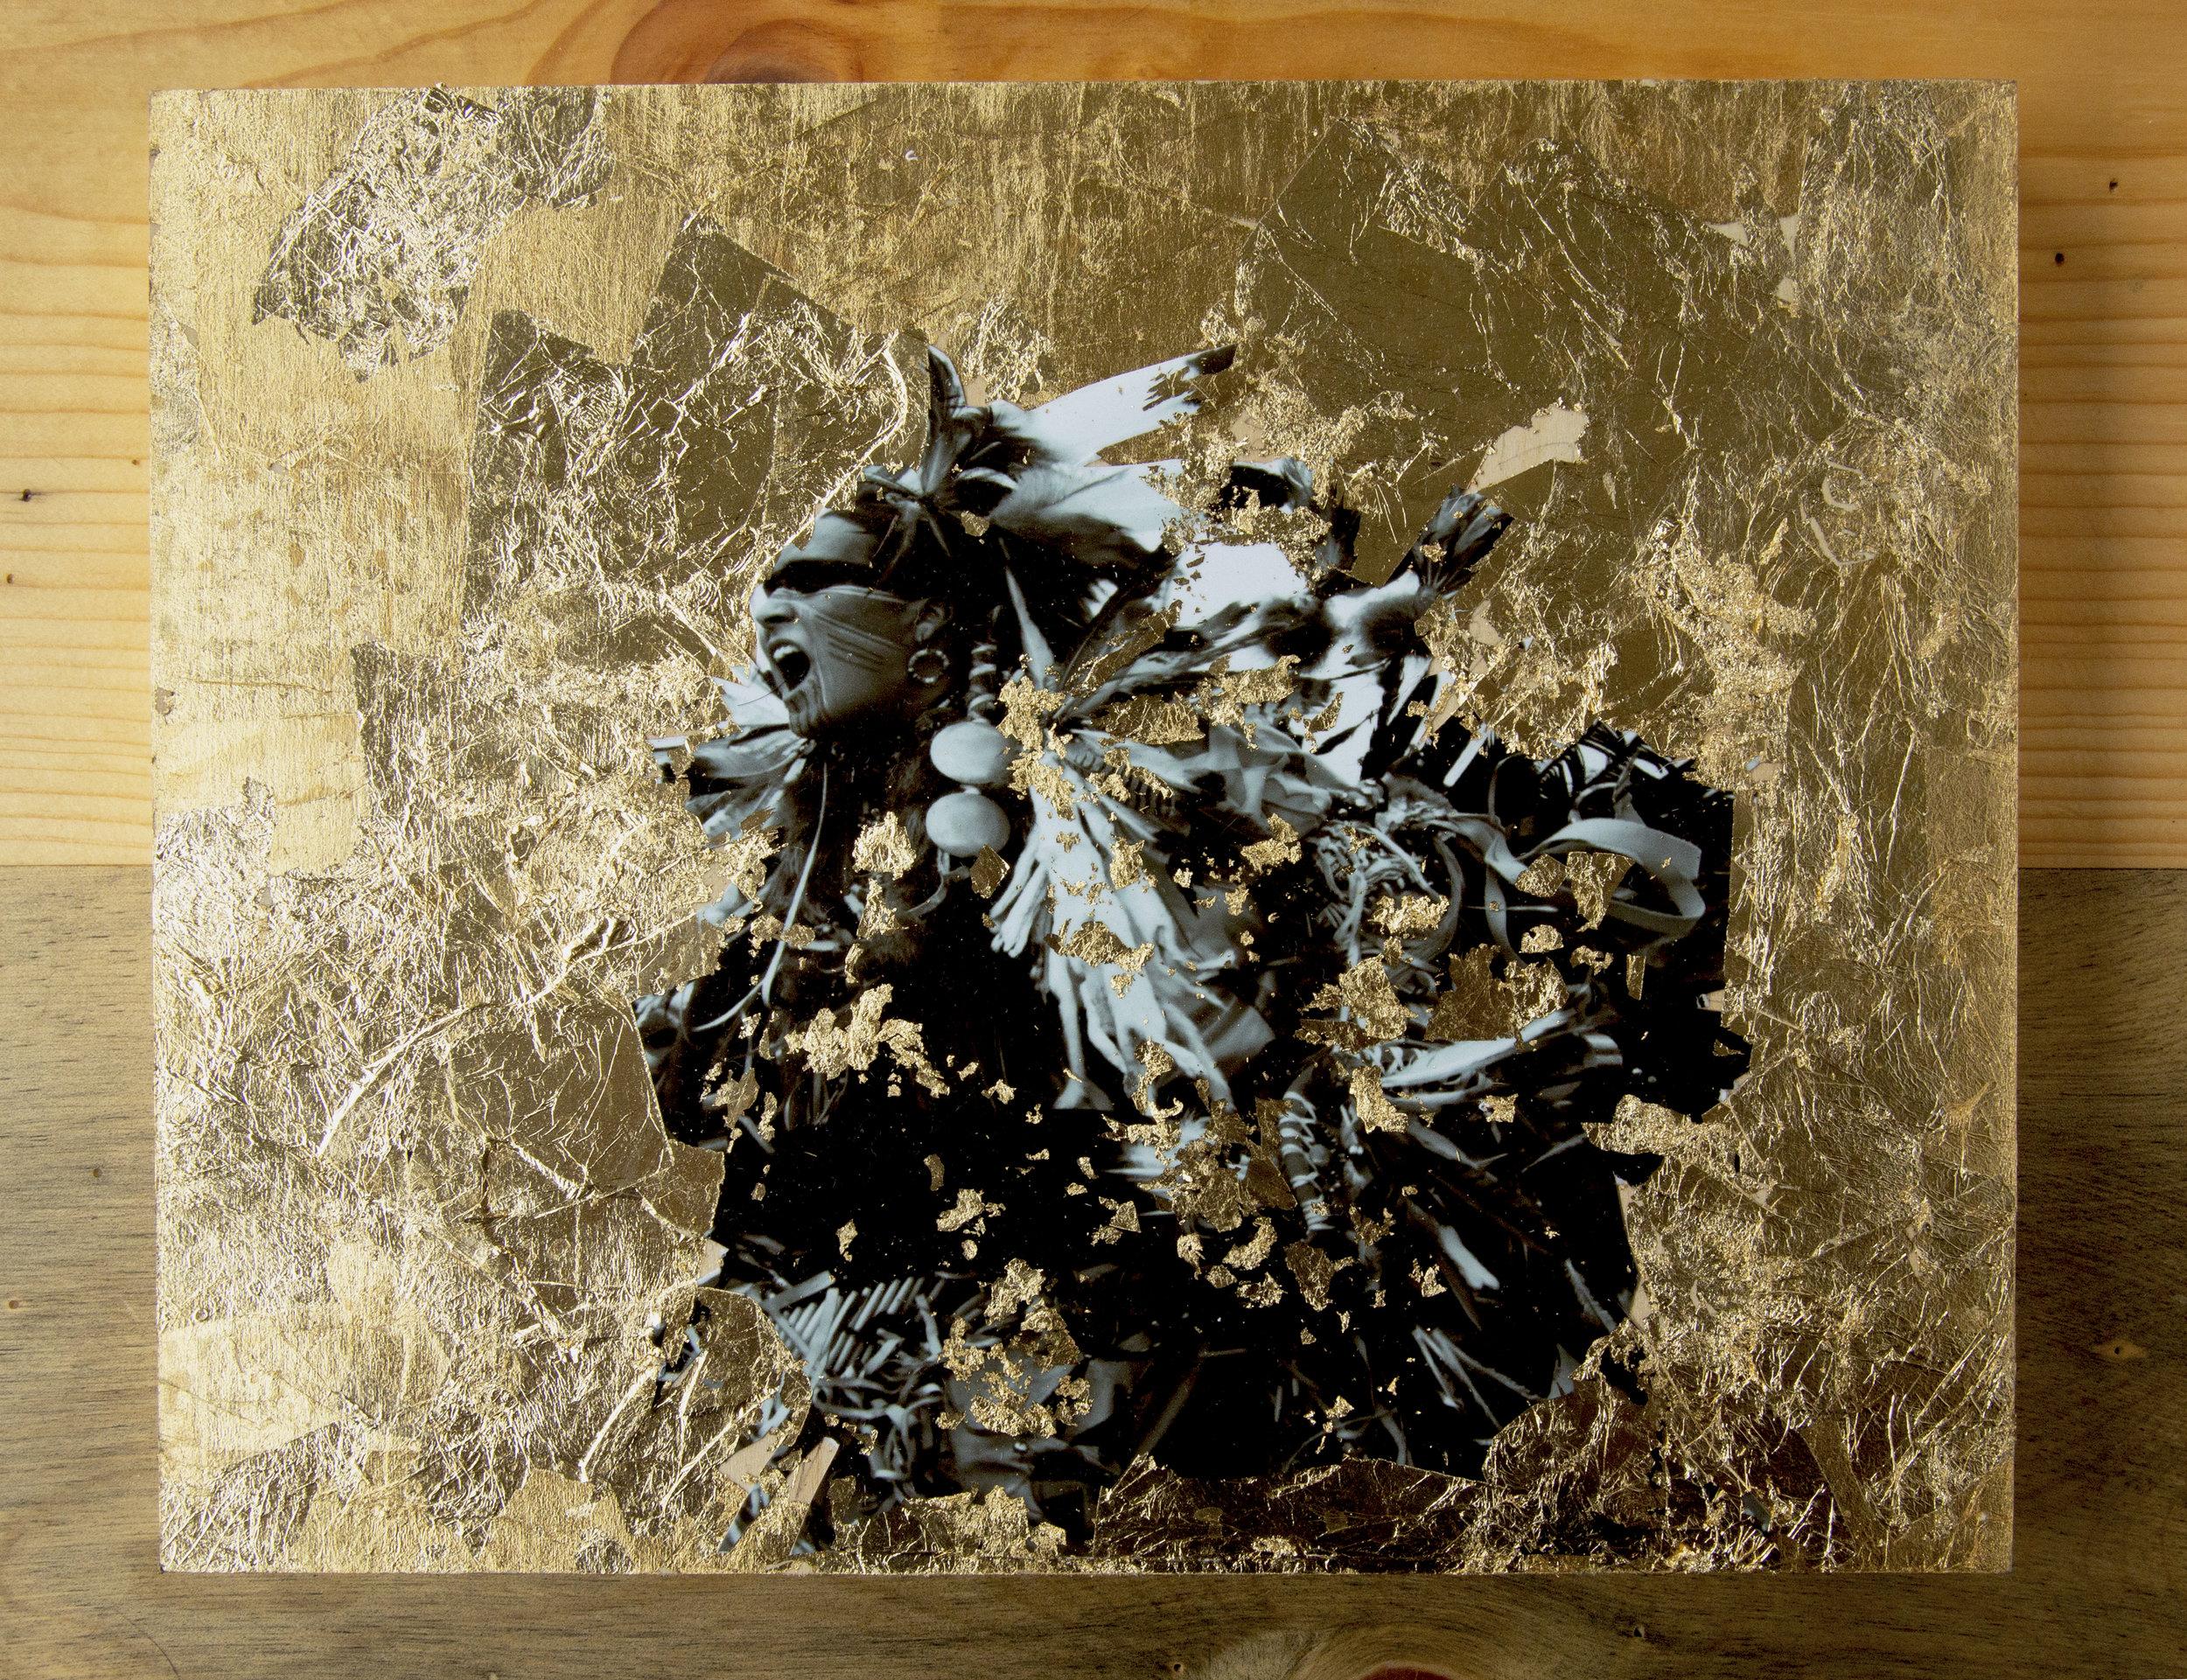 Gold Leaf Image by Robert I Mesa -11x14 05.jpg